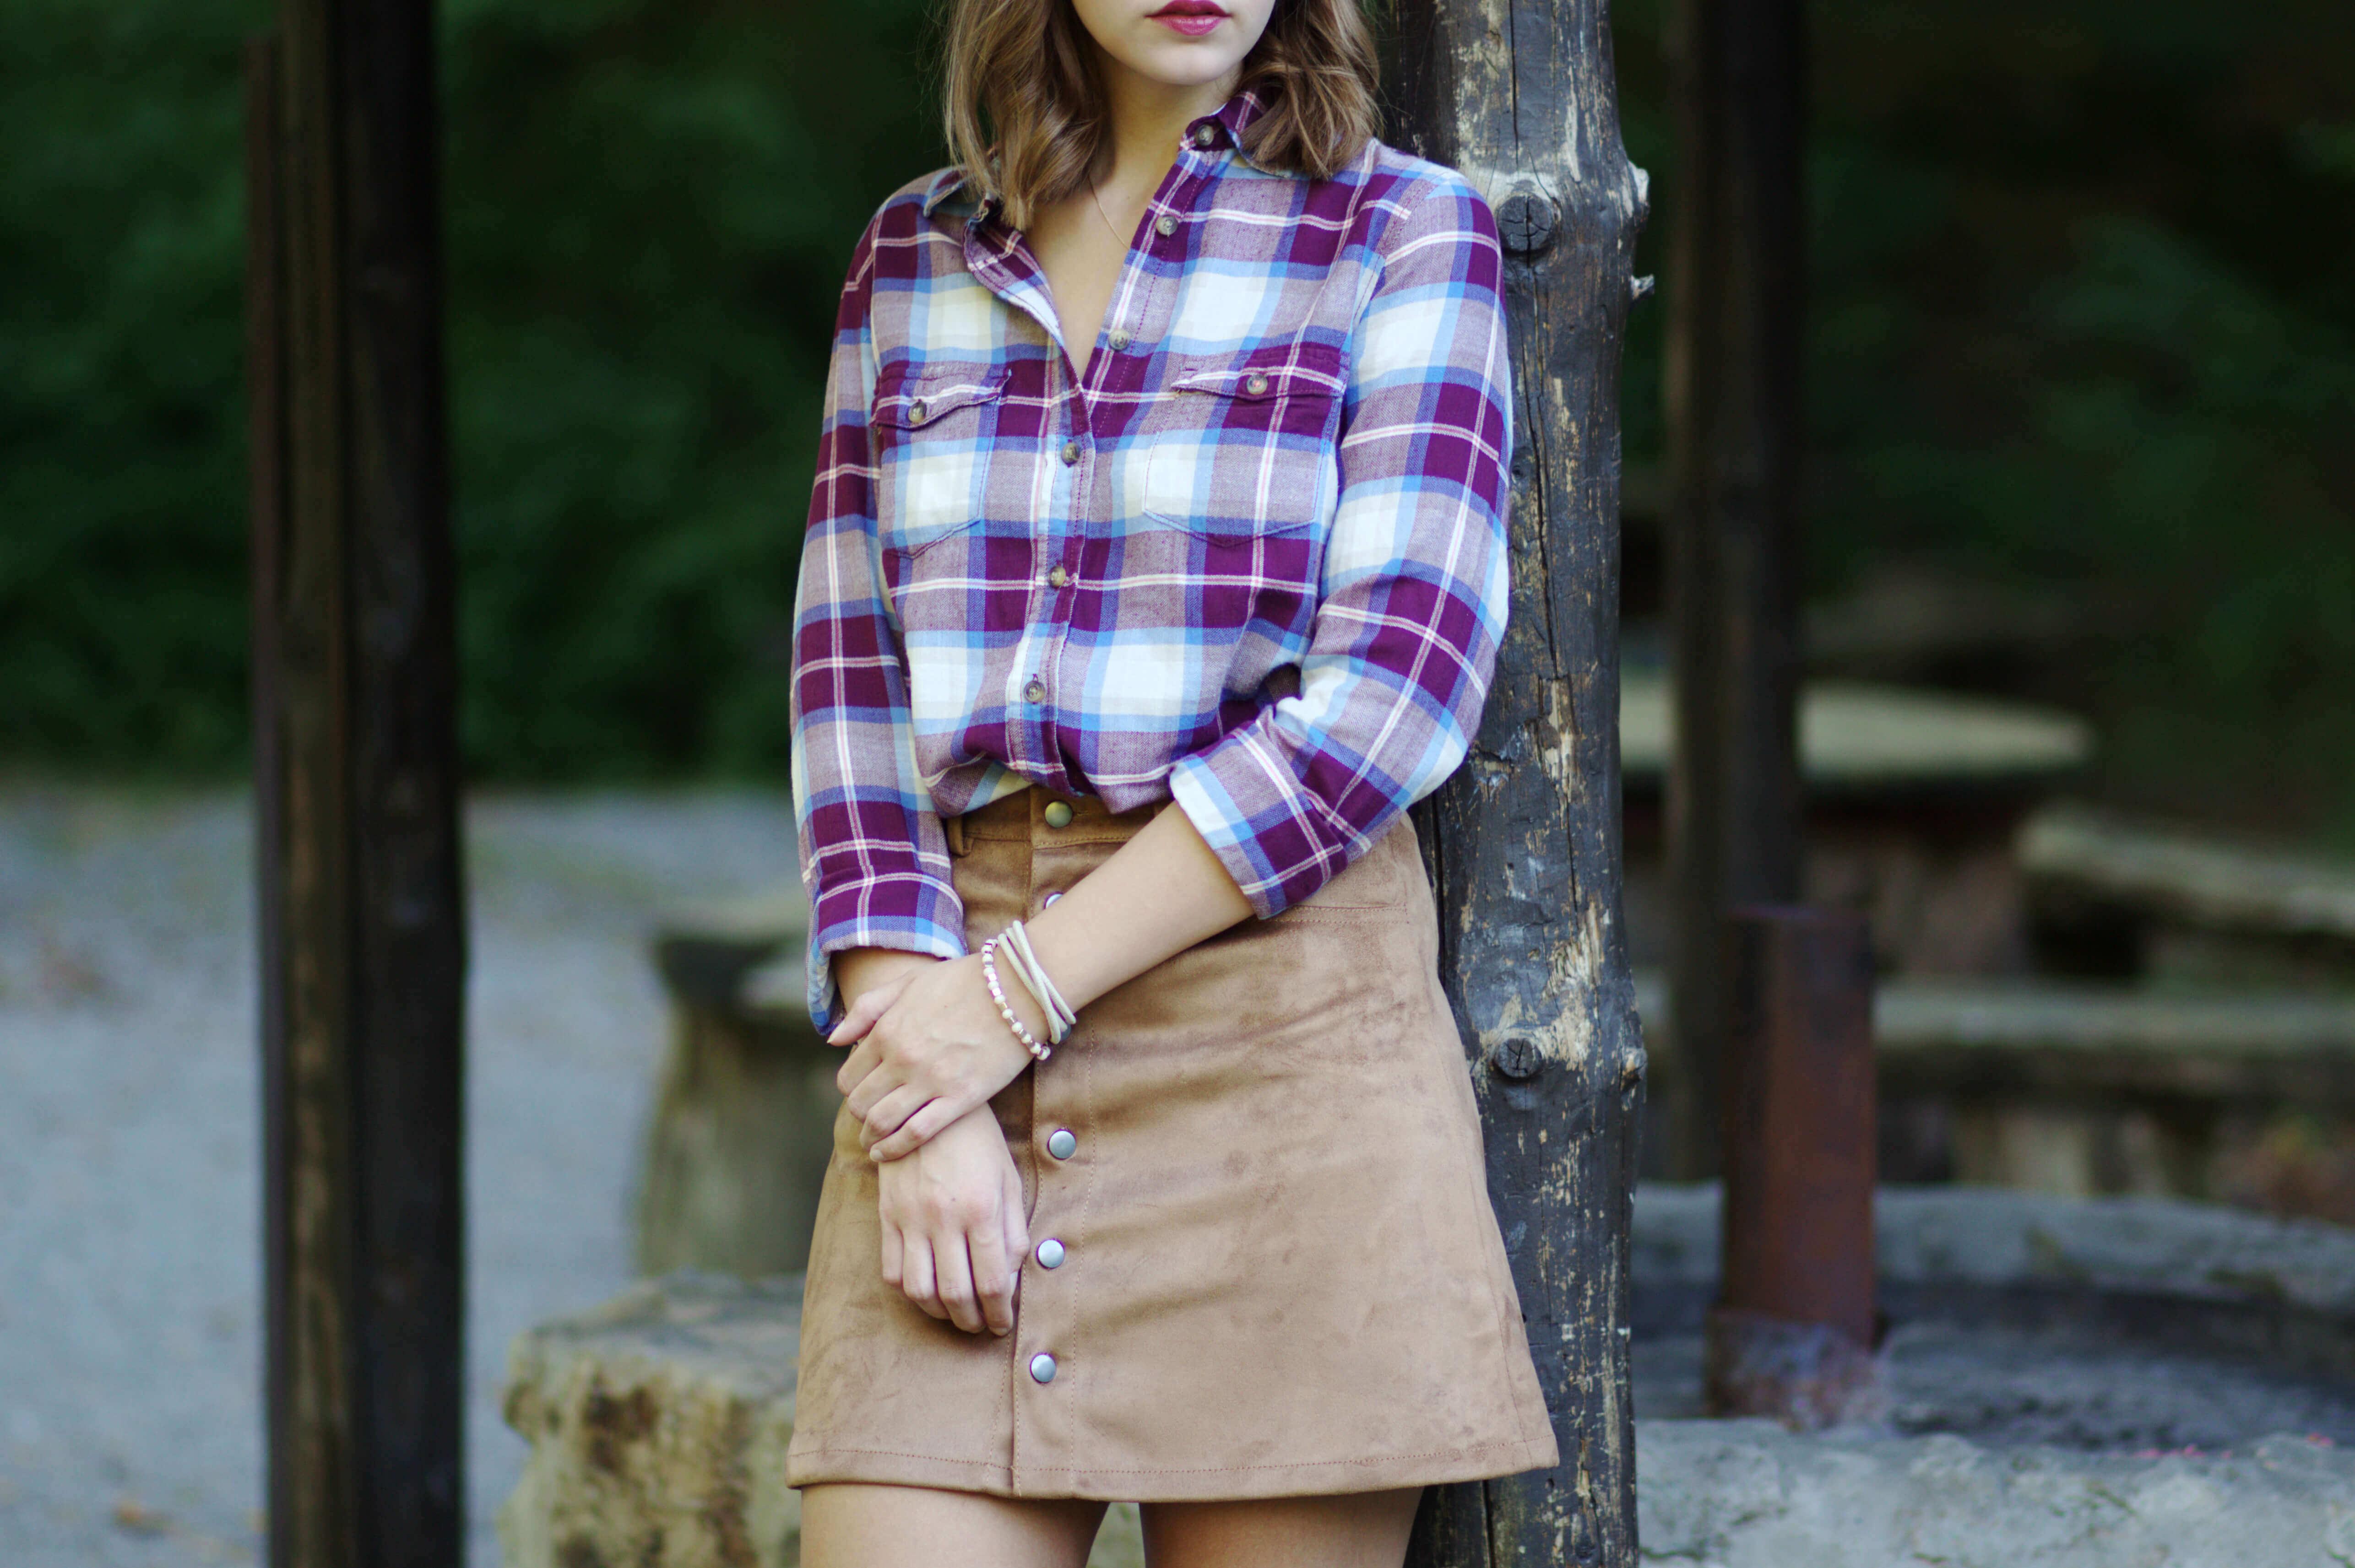 Oktoberfest Outfit - Alternative zum Dirndl - Shoelove by